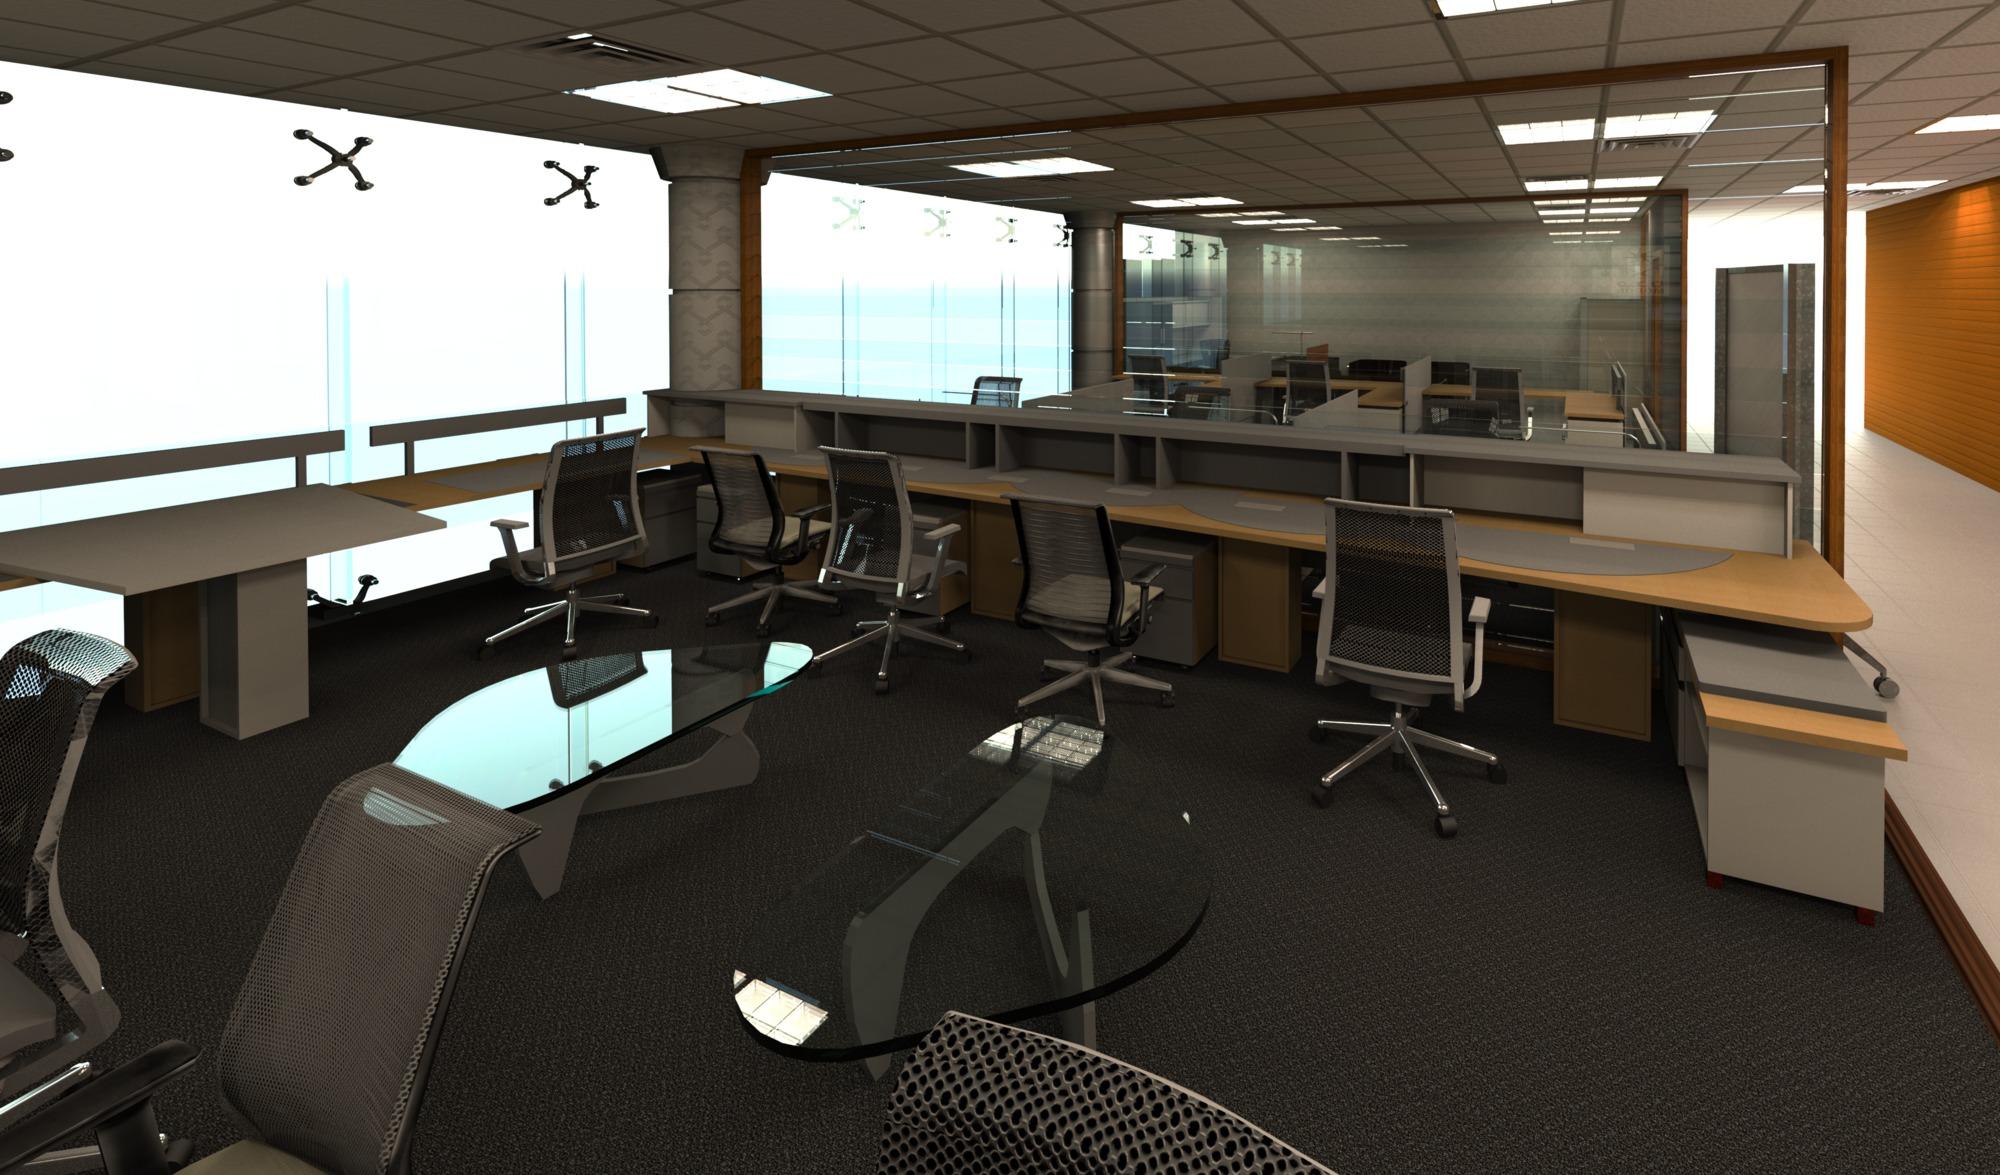 Raas-rendering20141214-30639-1o6e13m